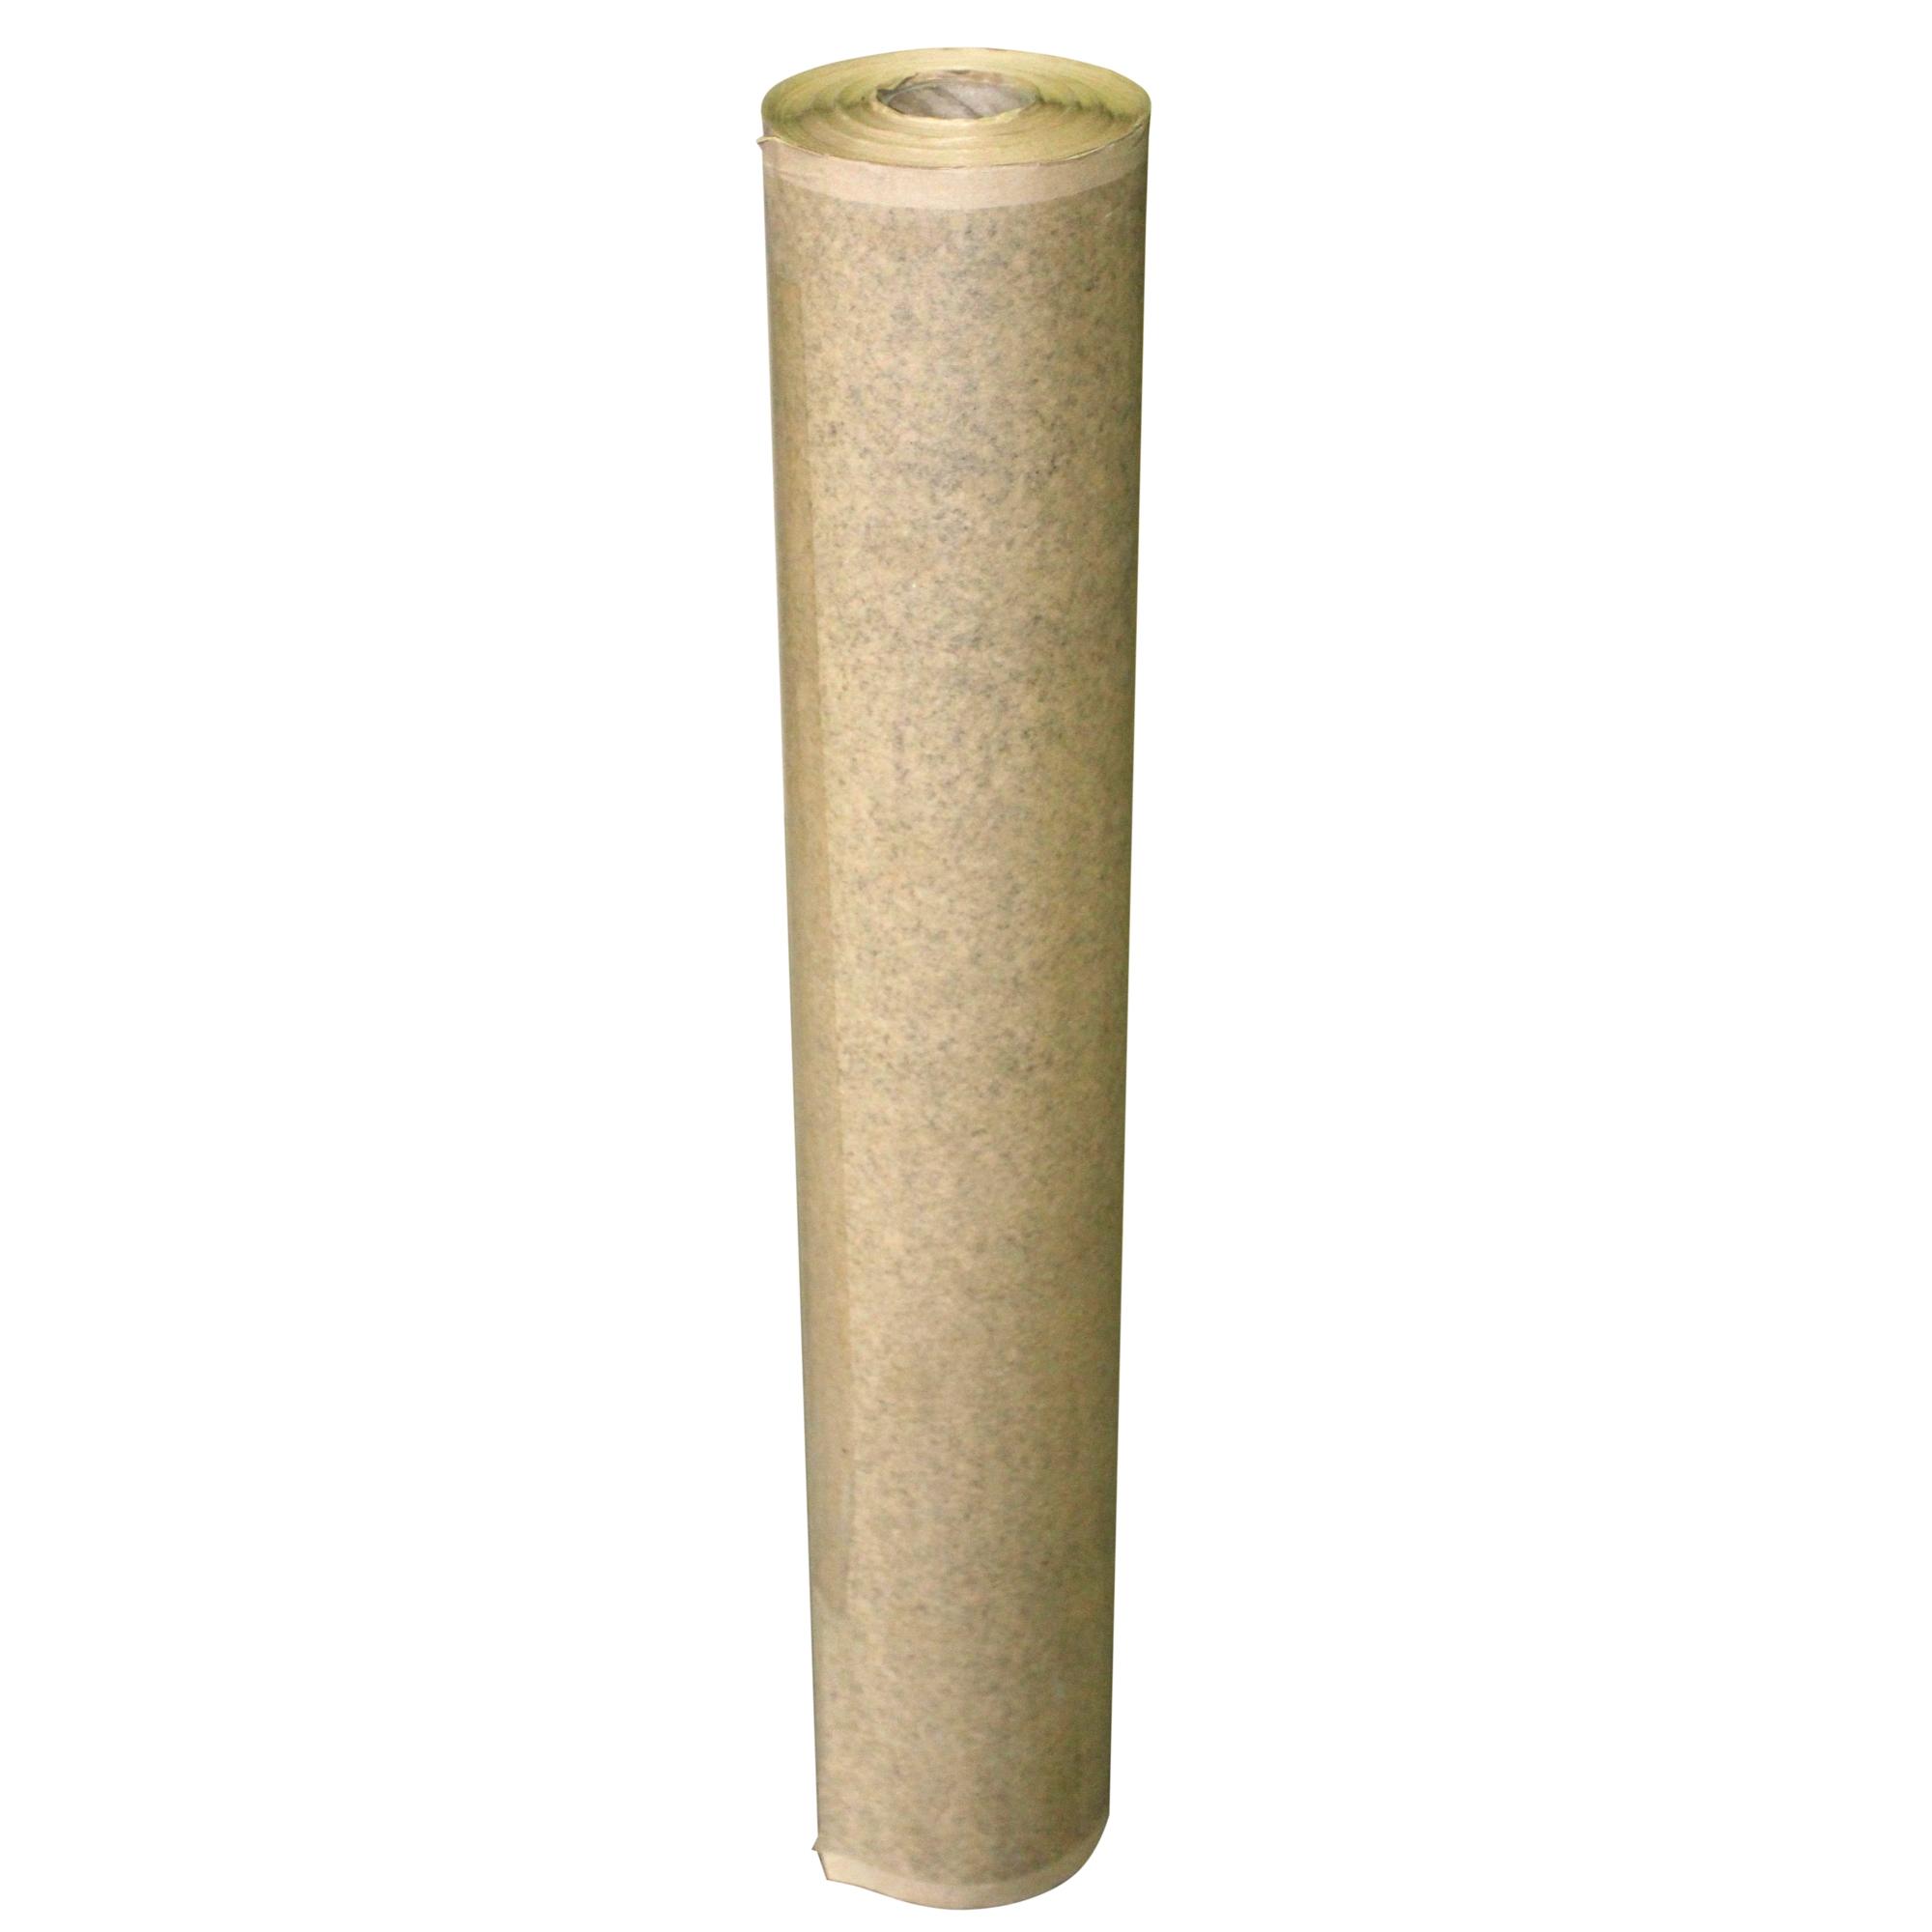 900mm 100mtr 175gsm Kraft Union Paper